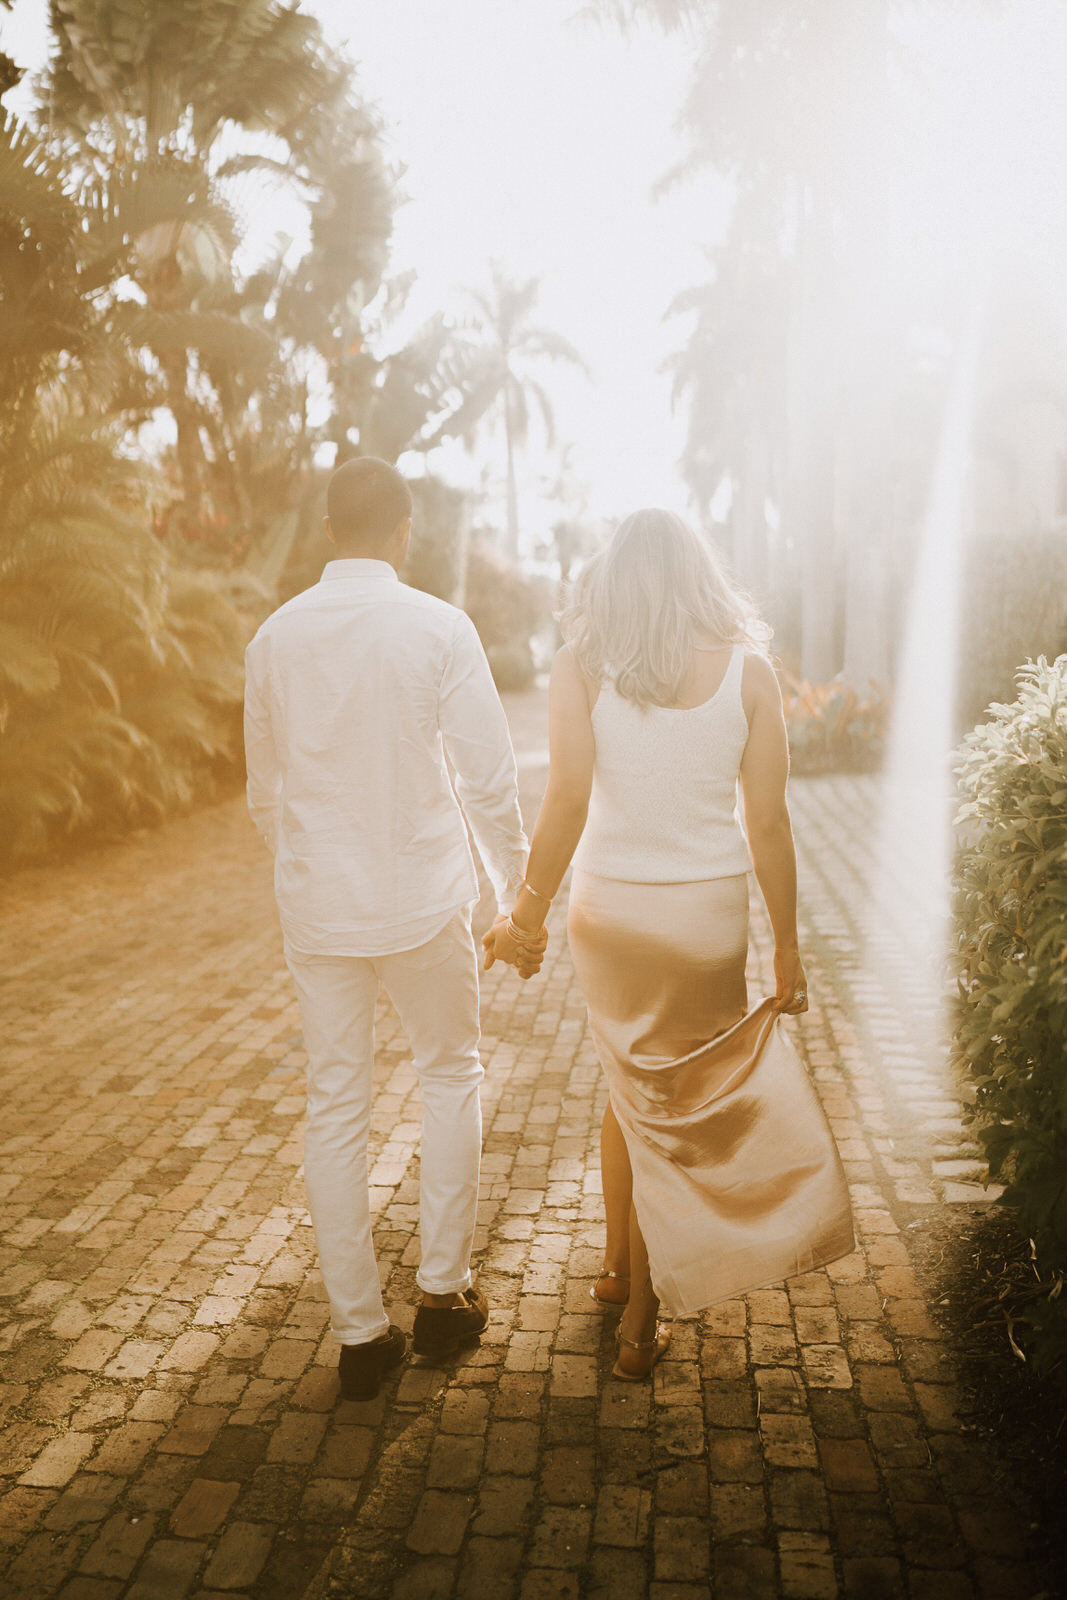 Naples 5th Ave Engagement Photos- Michelle Gonzalez Photography- Michele + Troy-24.JPG